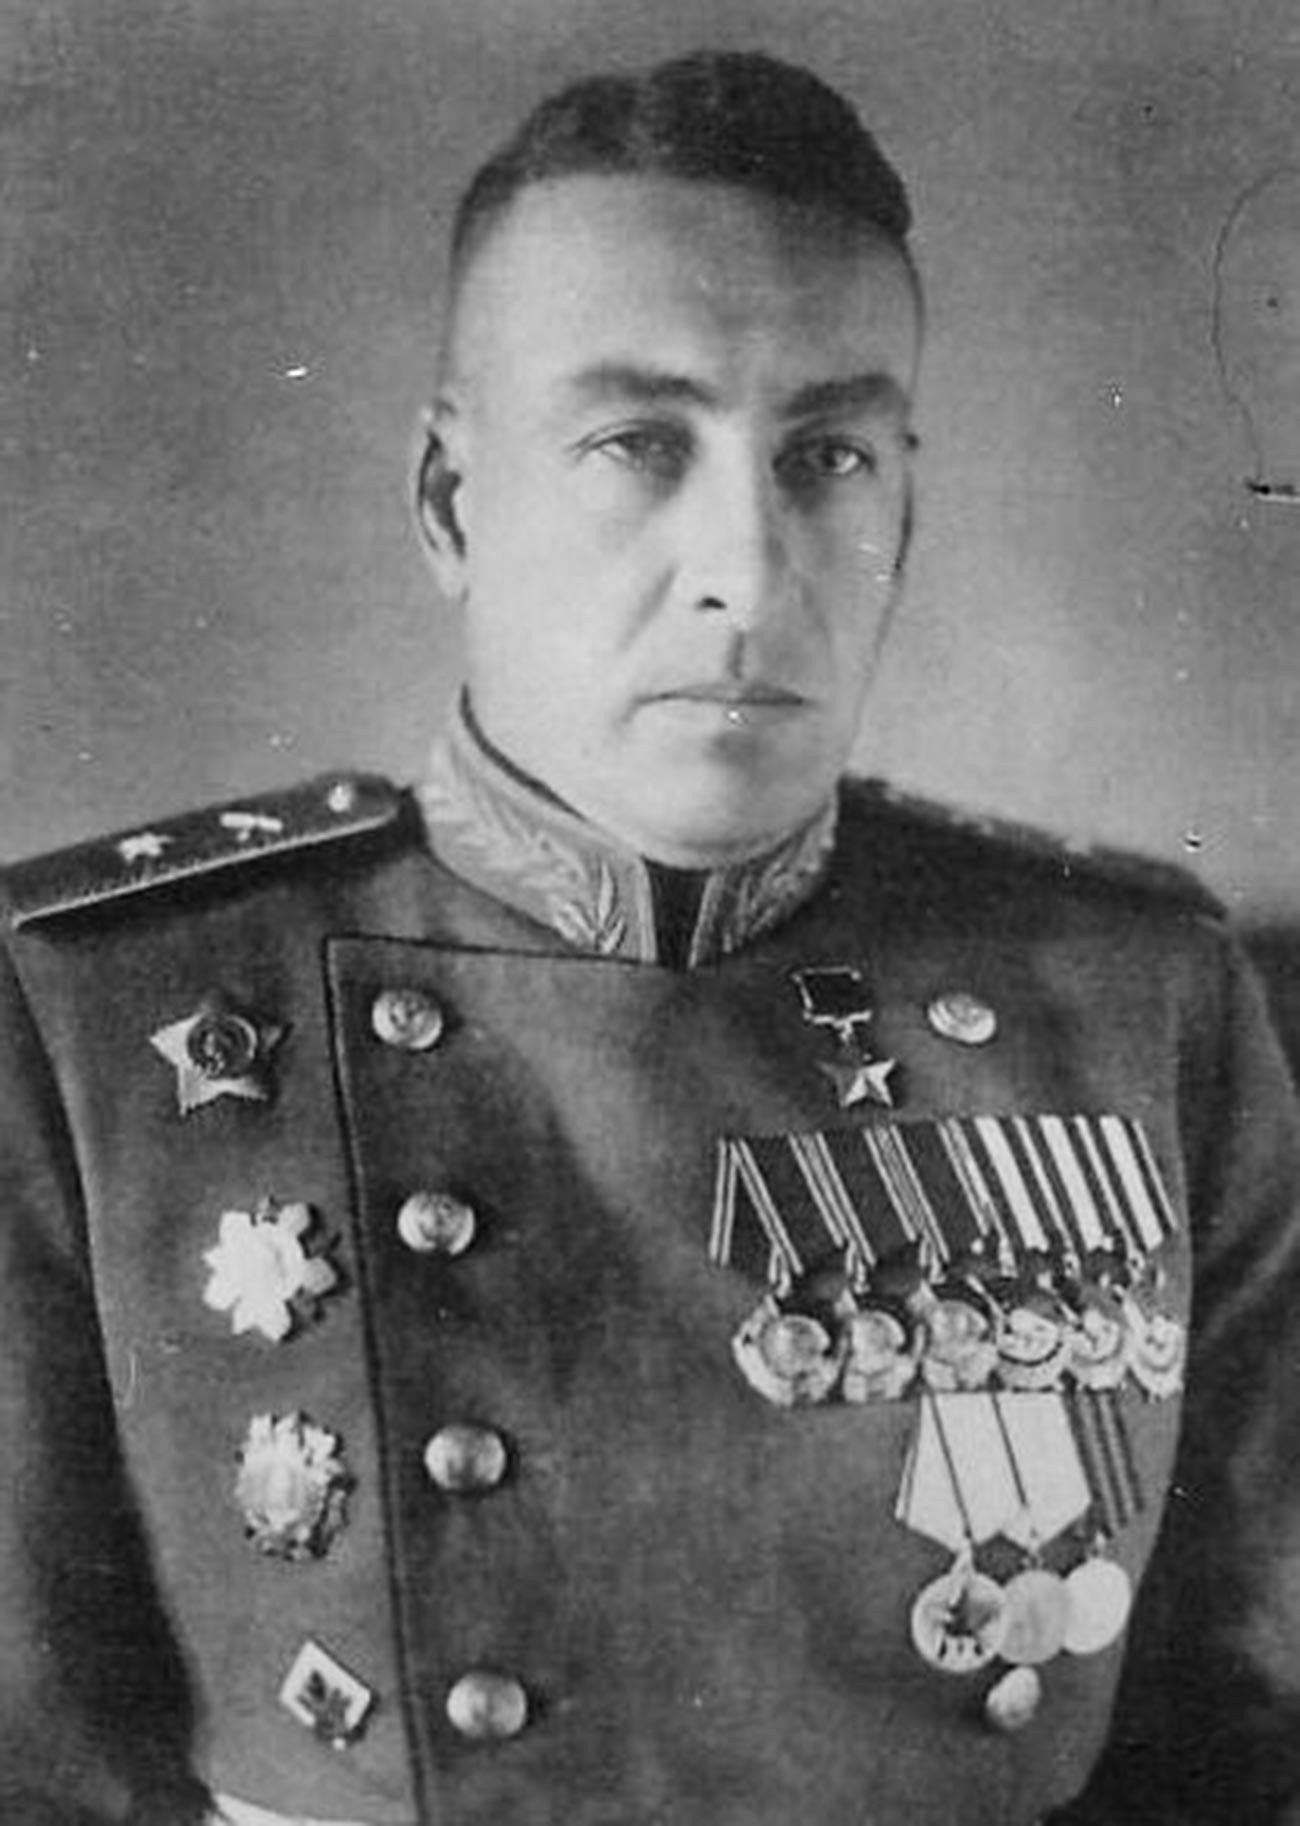 Junak Sovjetske zveze Sergej Sergejevič Volkenštejn